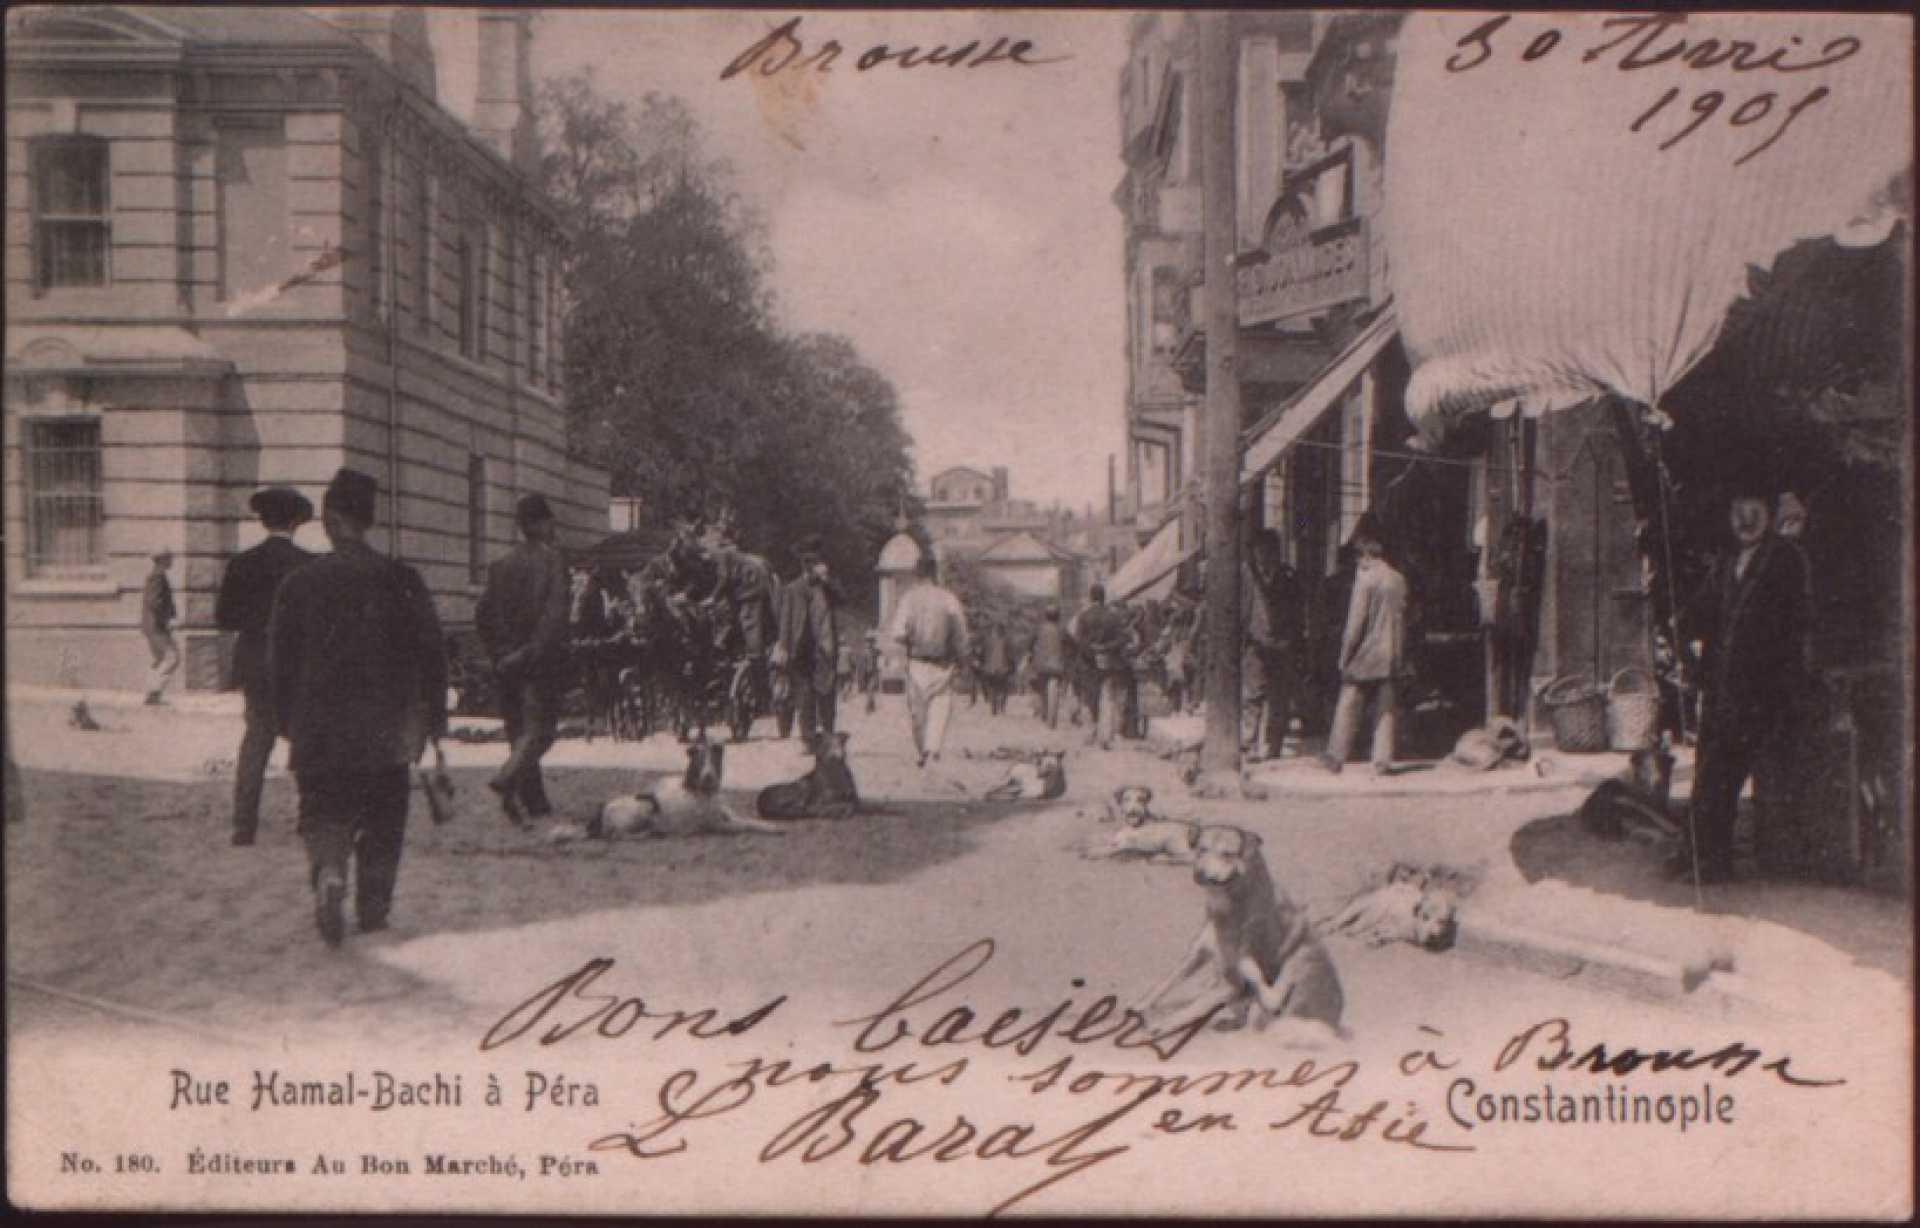 Rue Hamal – Bachi a Pera